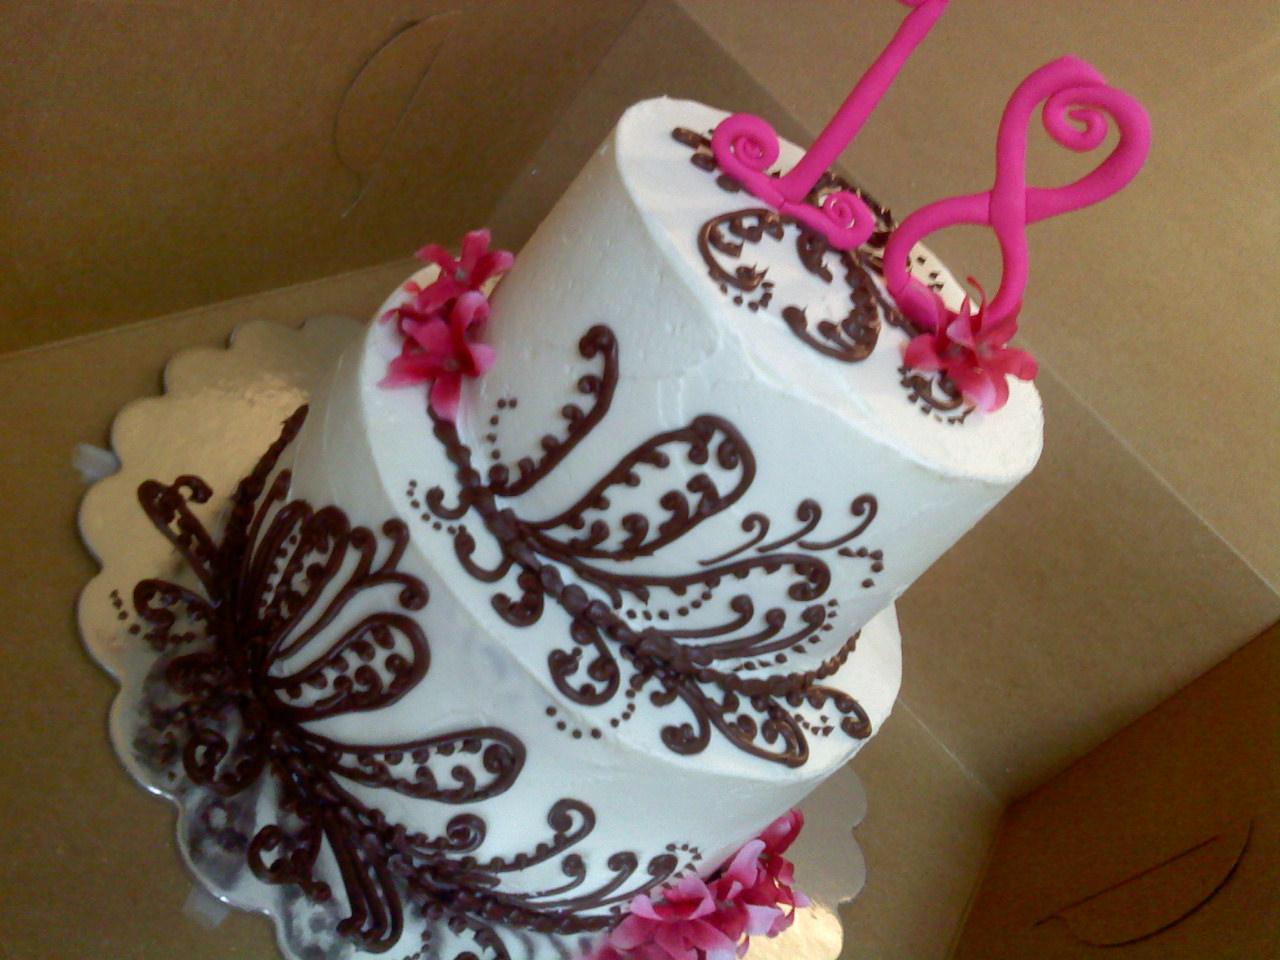 Girls 18th Birthday Cake Ideas And Designs